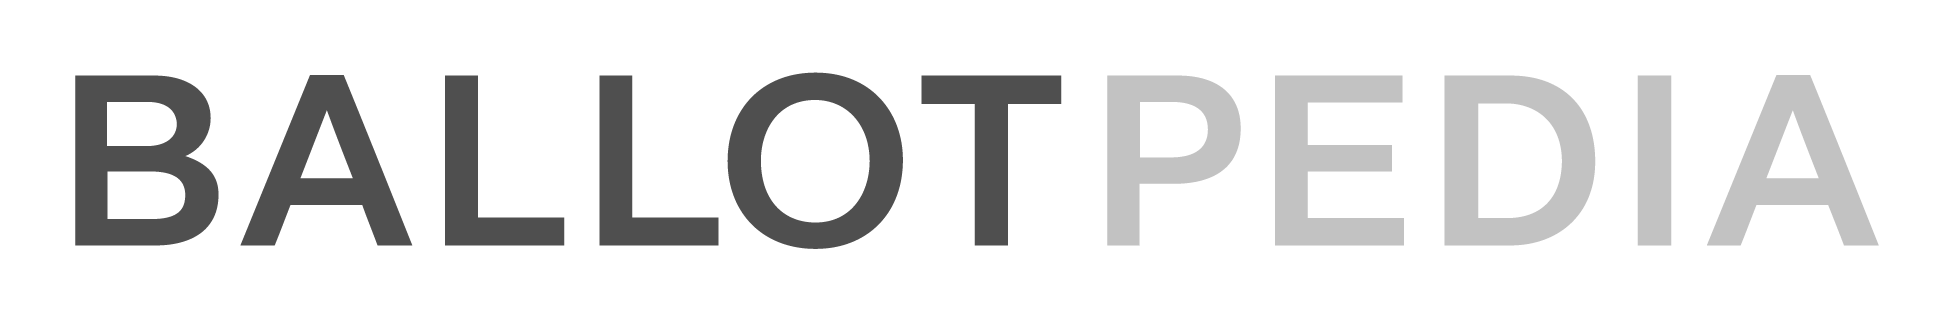 Ballotpedia-Logo-UPDATED_edited